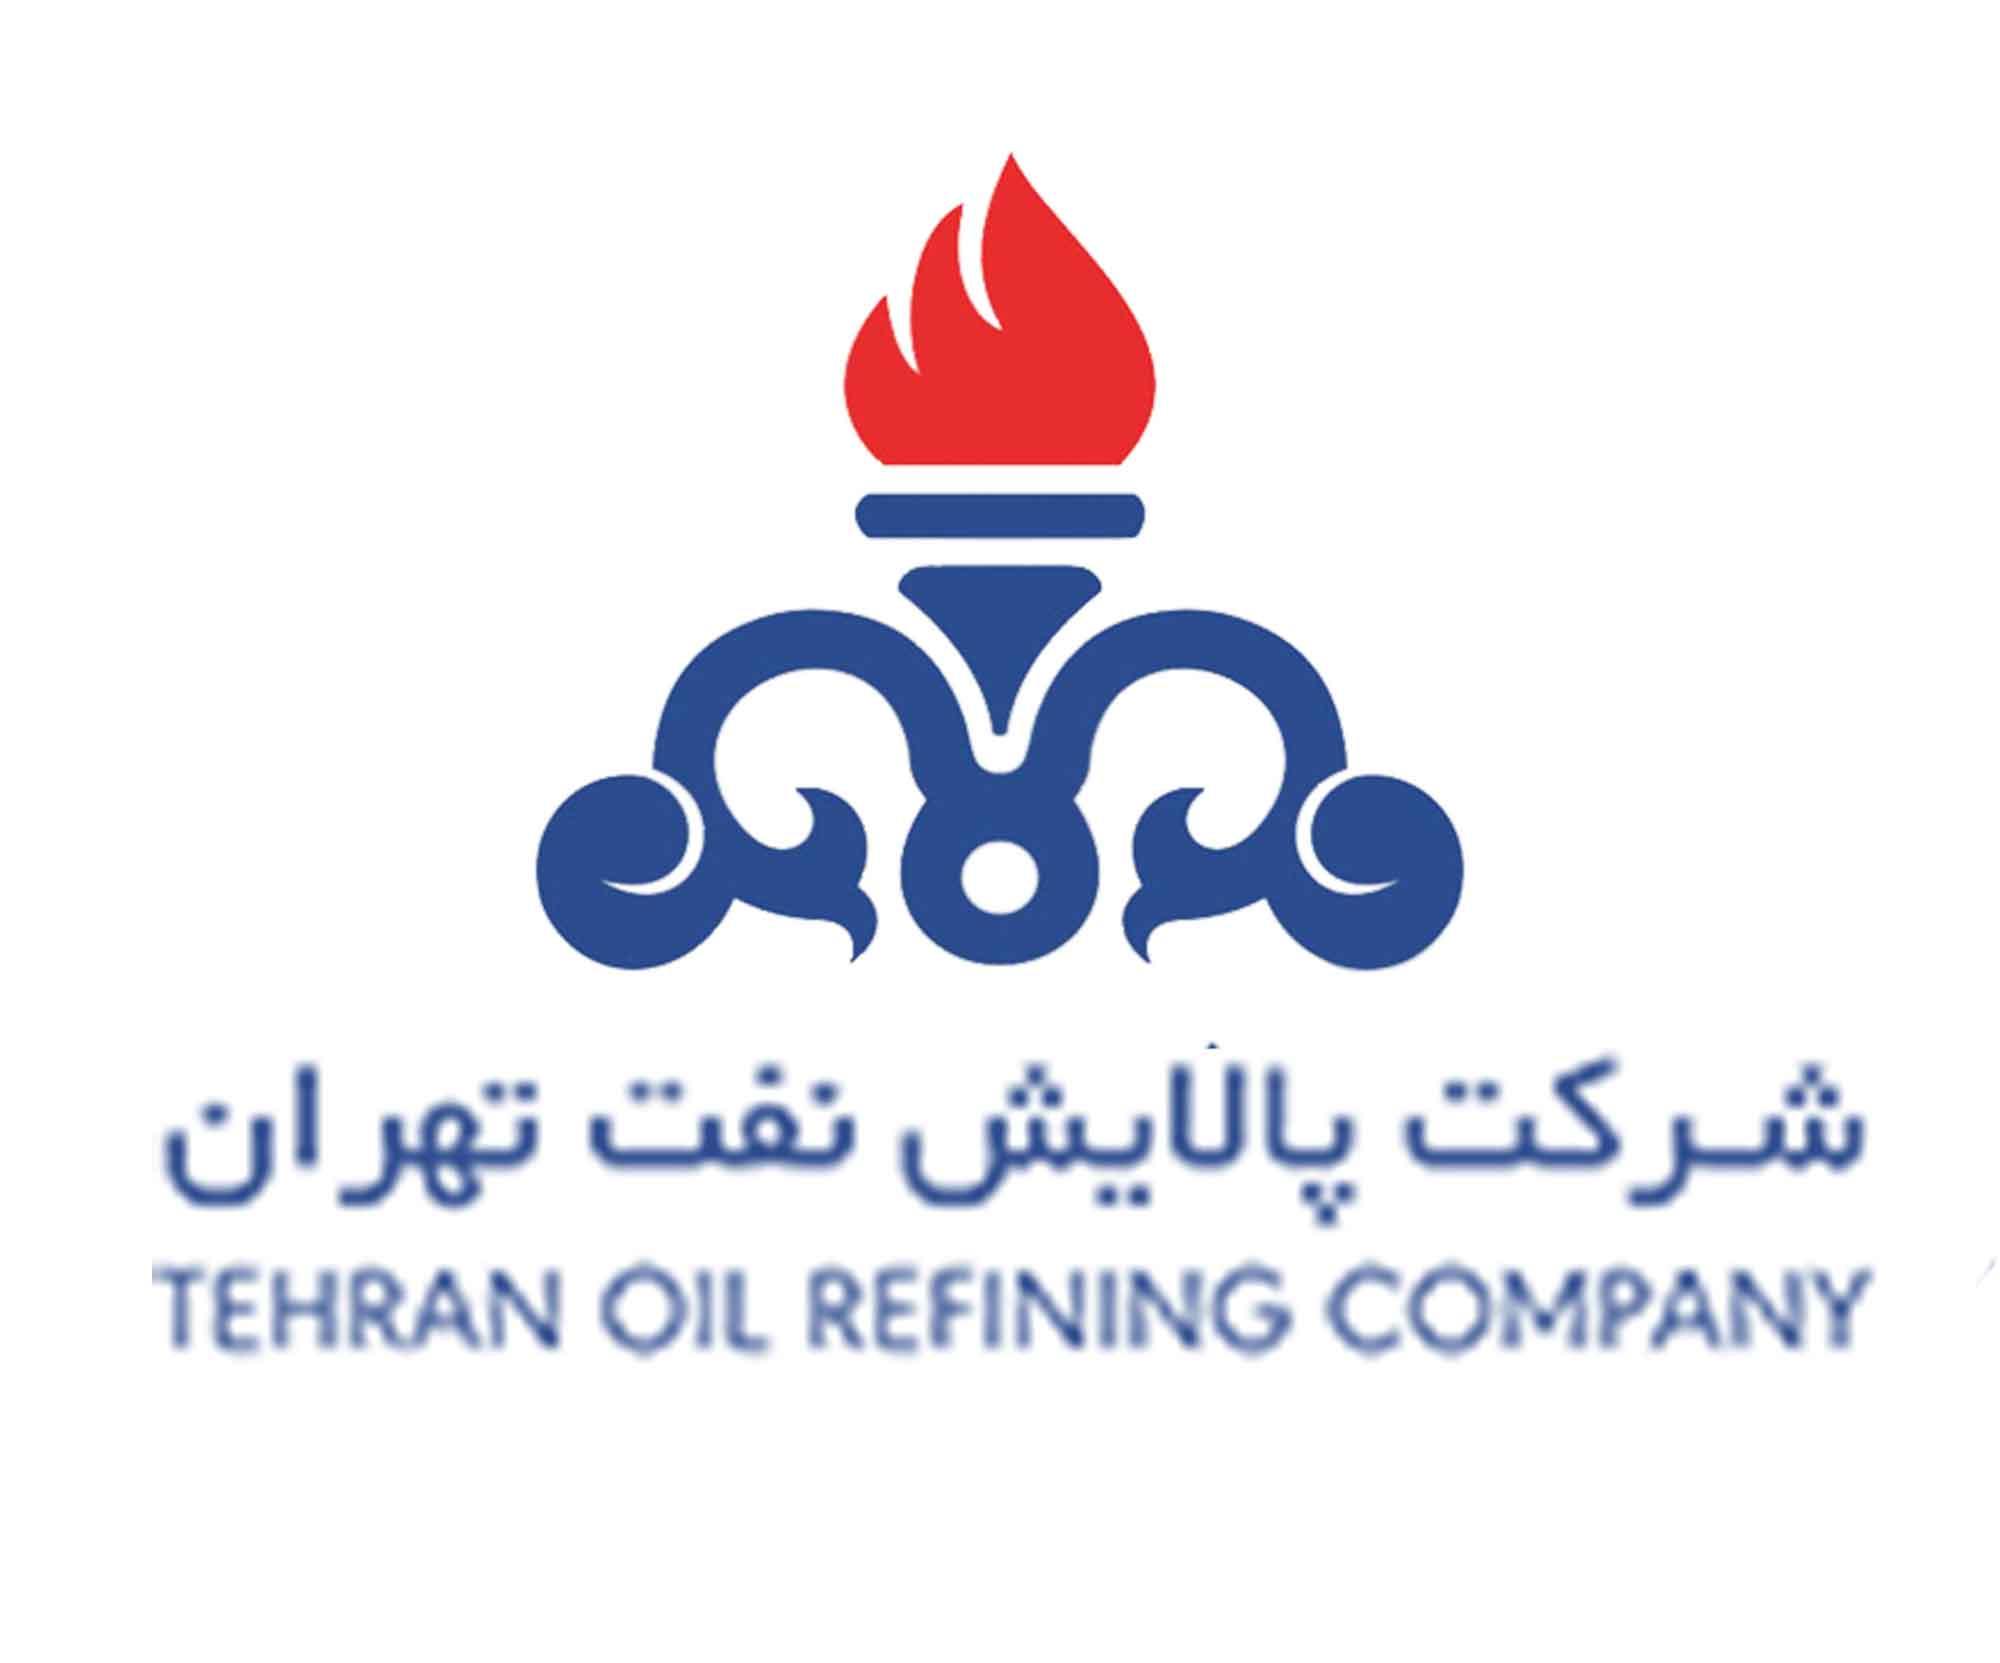 پالایش نفت تهران